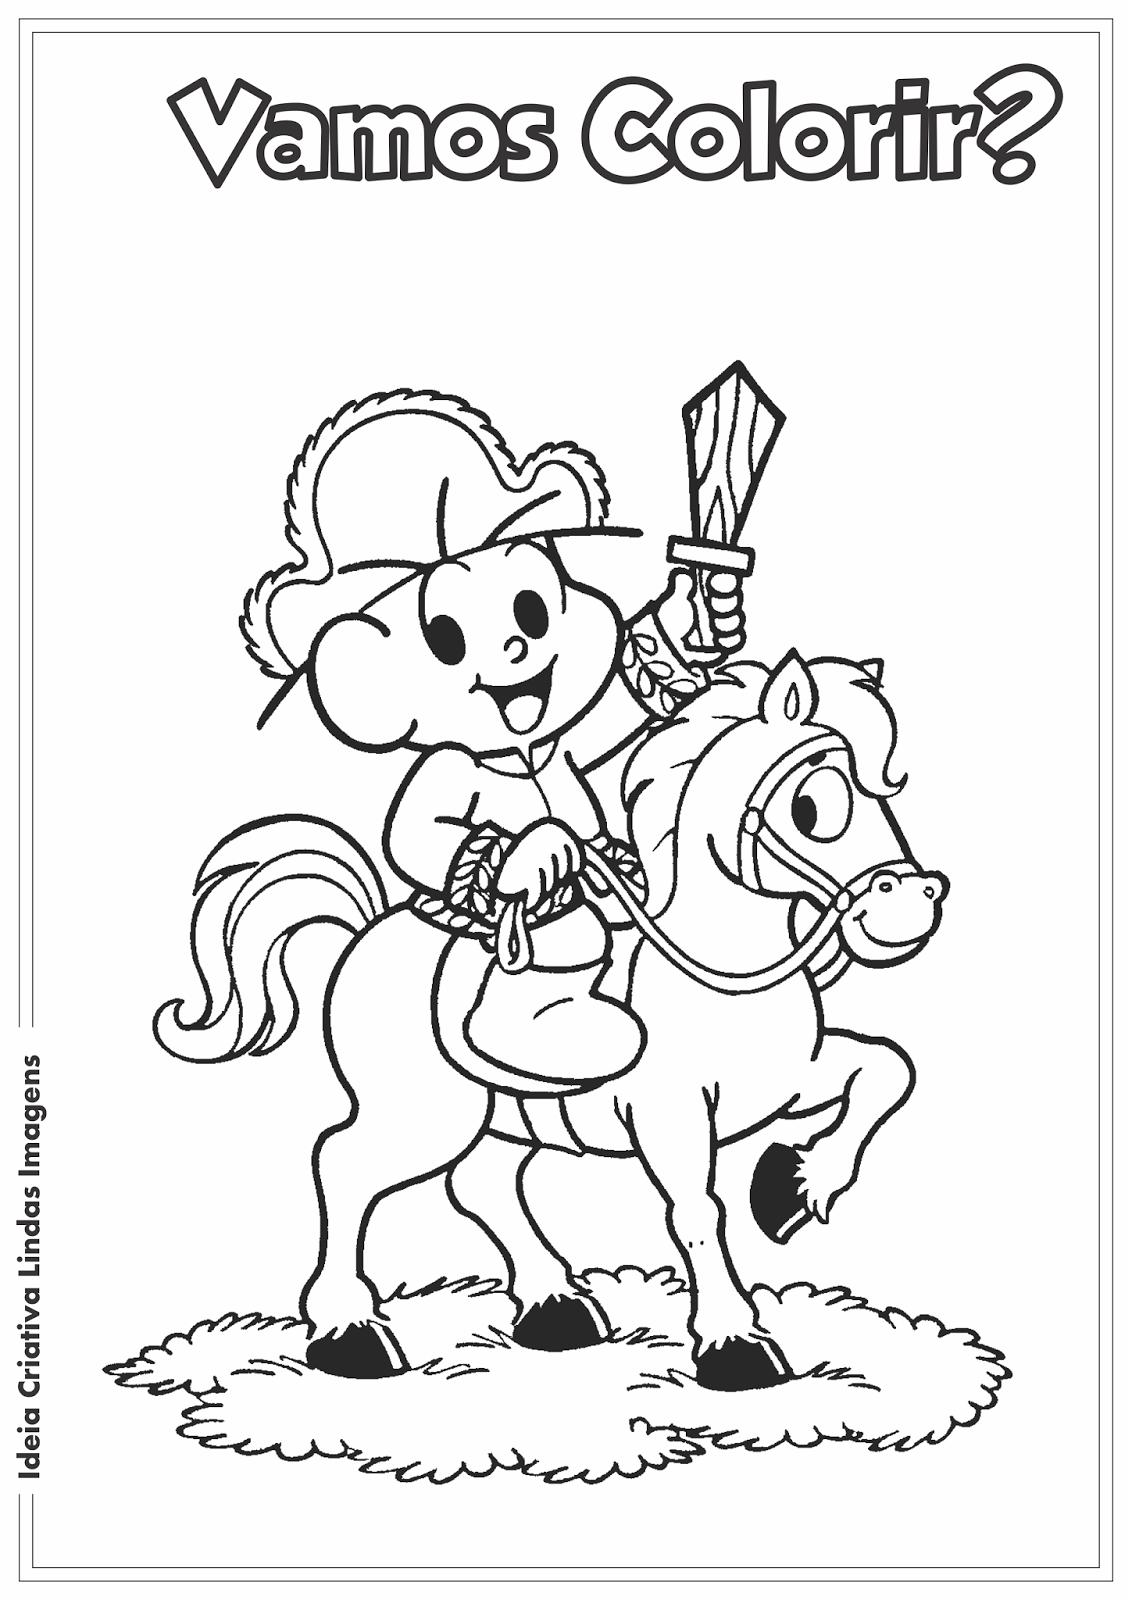 Desenho pra colorir - Dia da Independência do Brasil Turma da Mônica